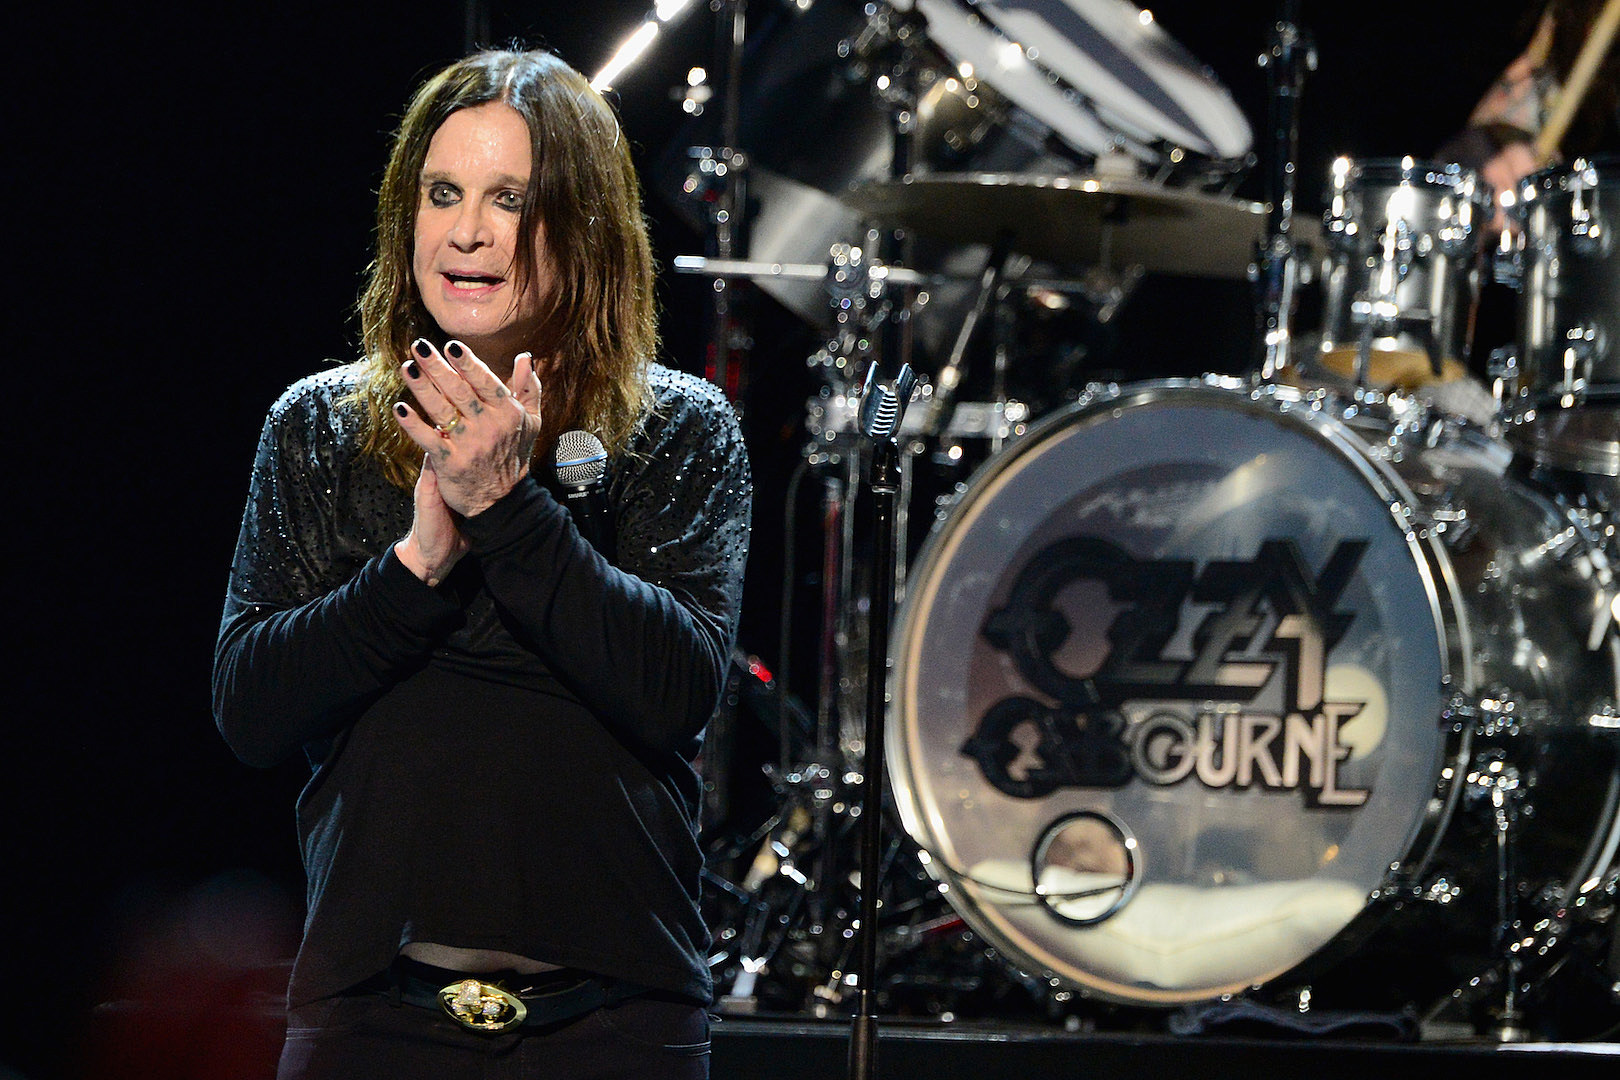 Sharon Osbourne Pulled Ozzy Osbourne From Black Sabbath Grammy Salute Over Ceremony Snub